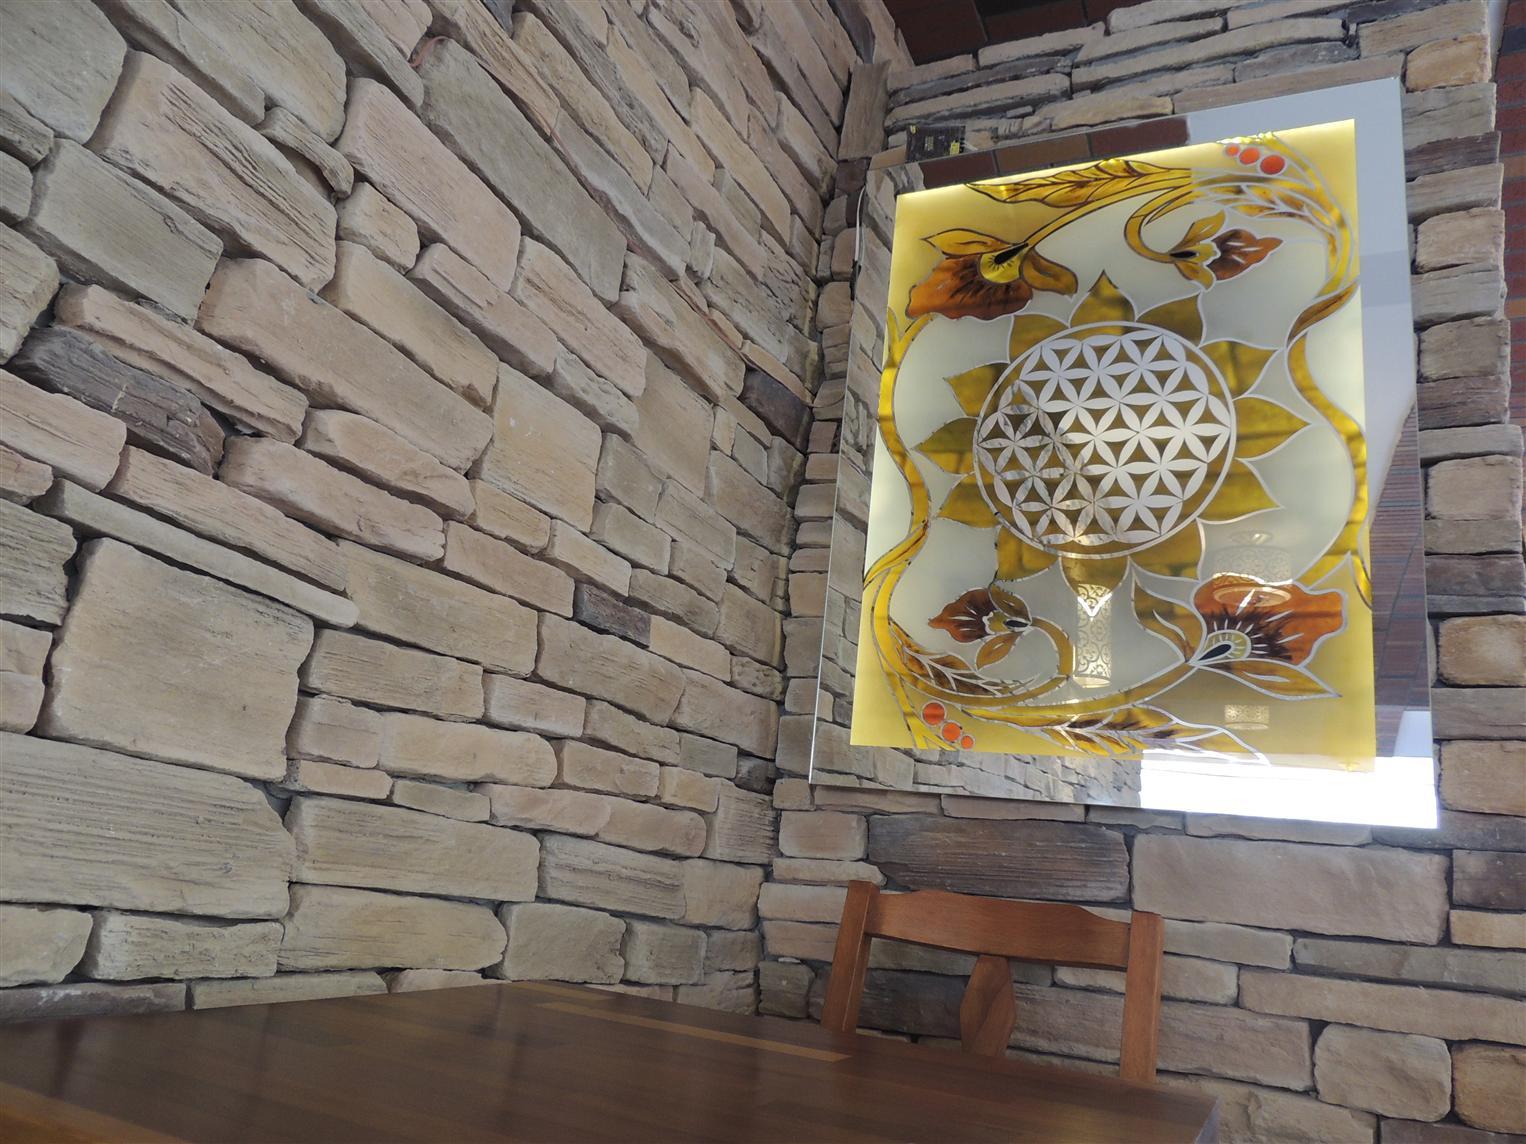 adria-cafe2015921173633510.jpg izmir vitray çalışması